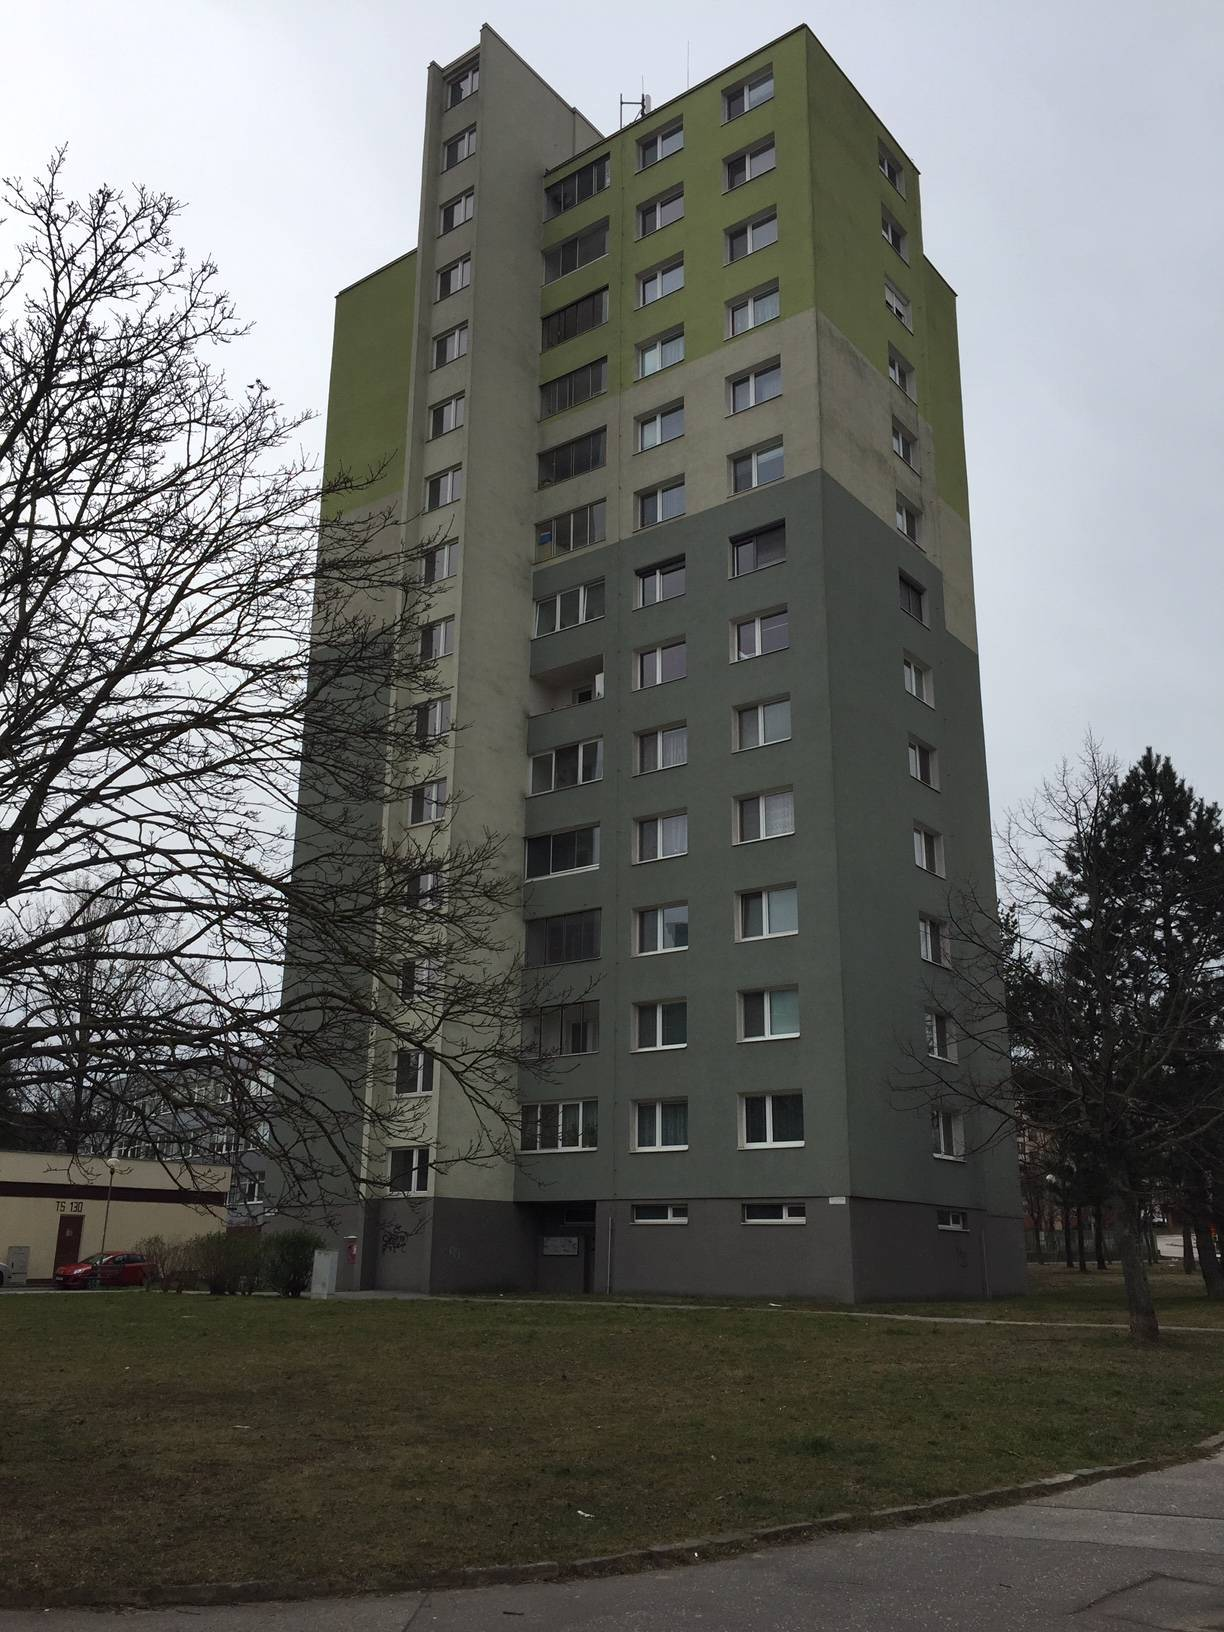 Predaj bytu (1- izbový) 38 m2, Bratislava - Dúbravka